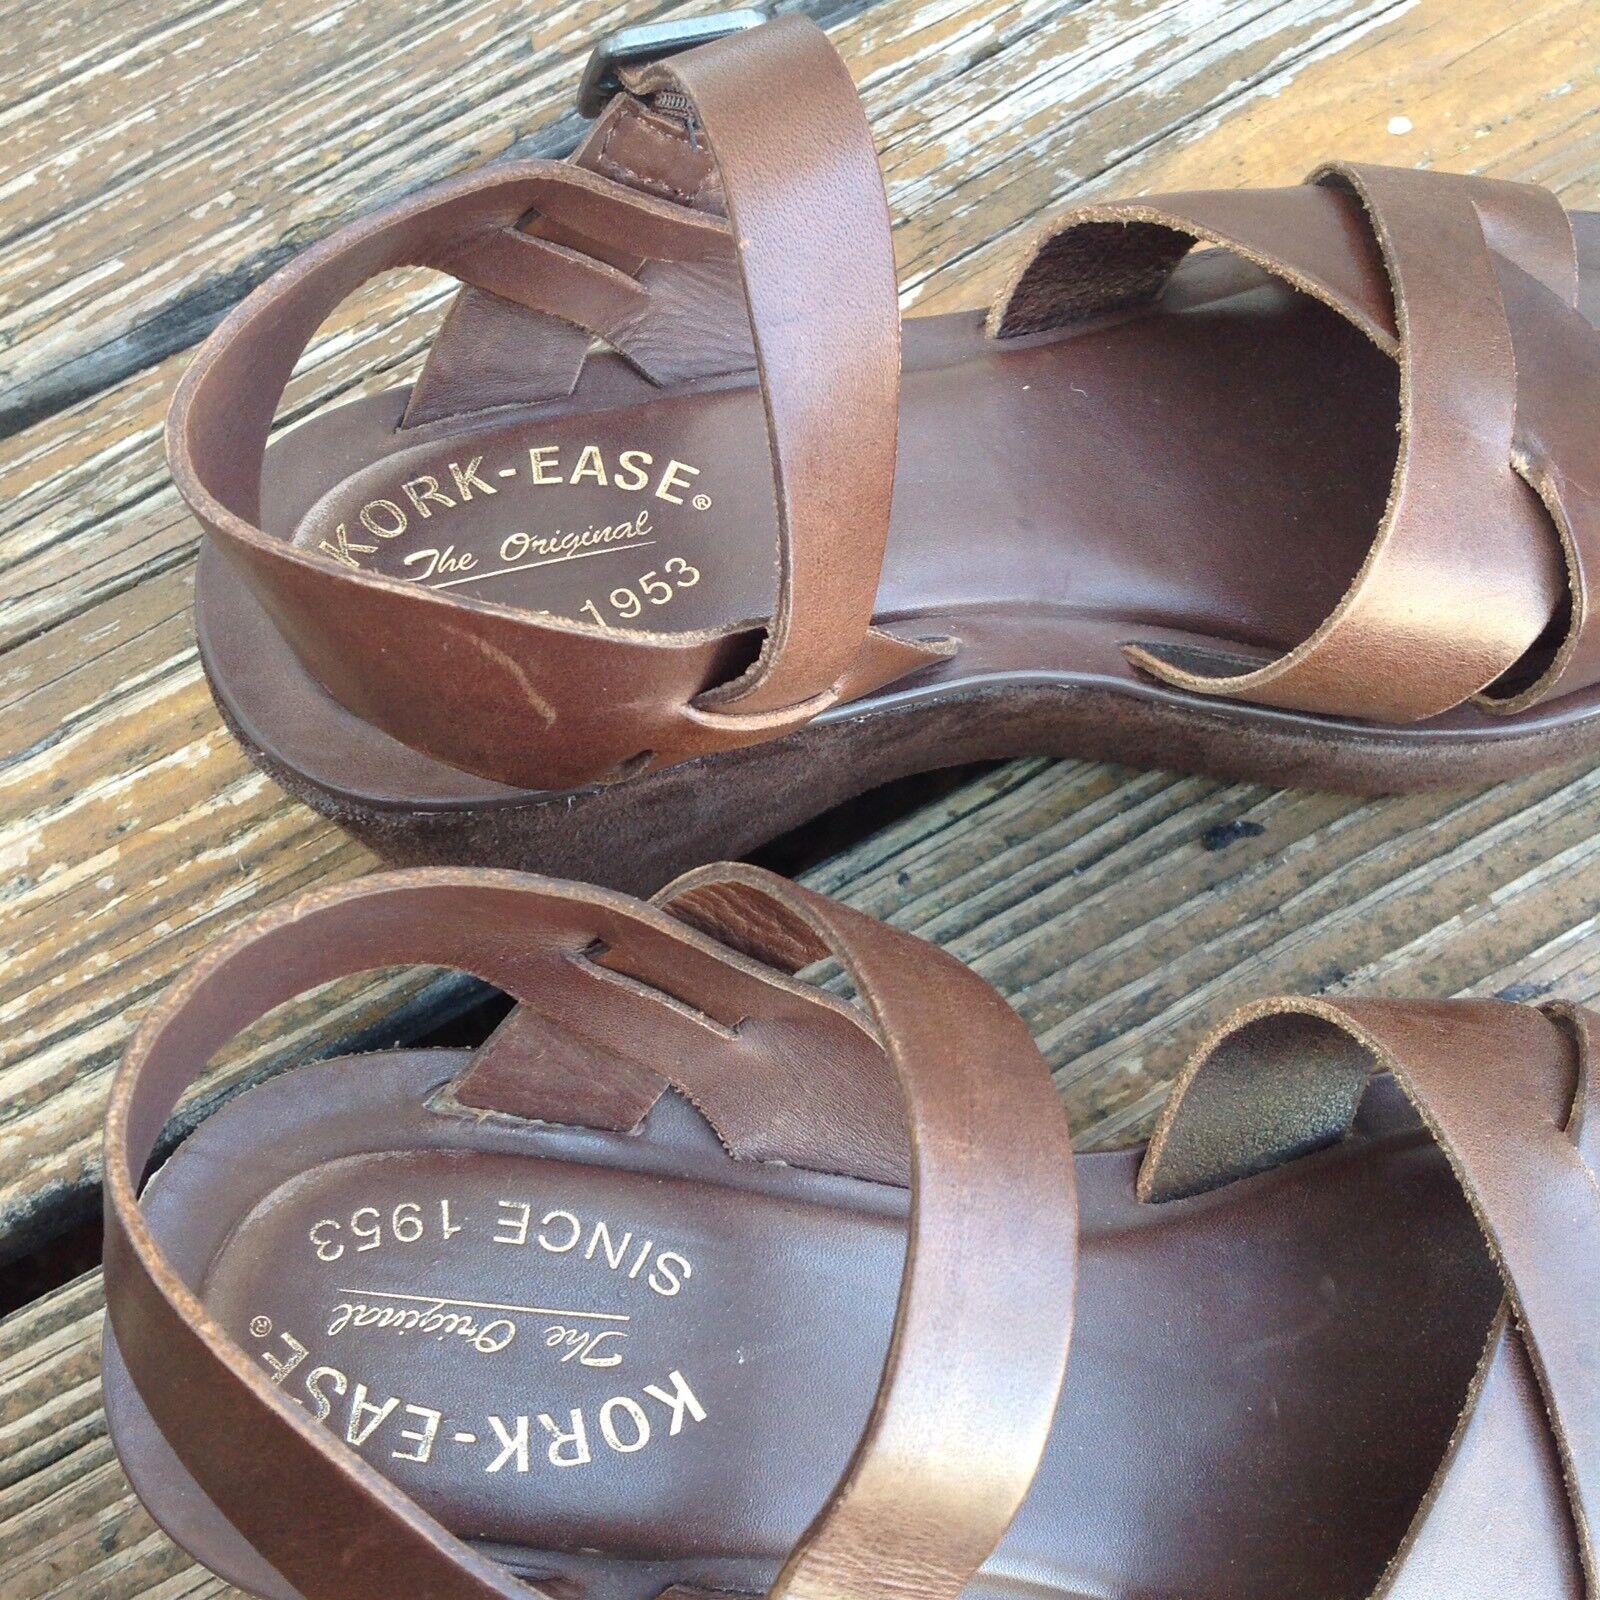 Kork Ease Braun Wedge Platform Sandales Damenschuhe 9 Heels EU 39 Leder Suede Heels 9 Schuhes e24ebb